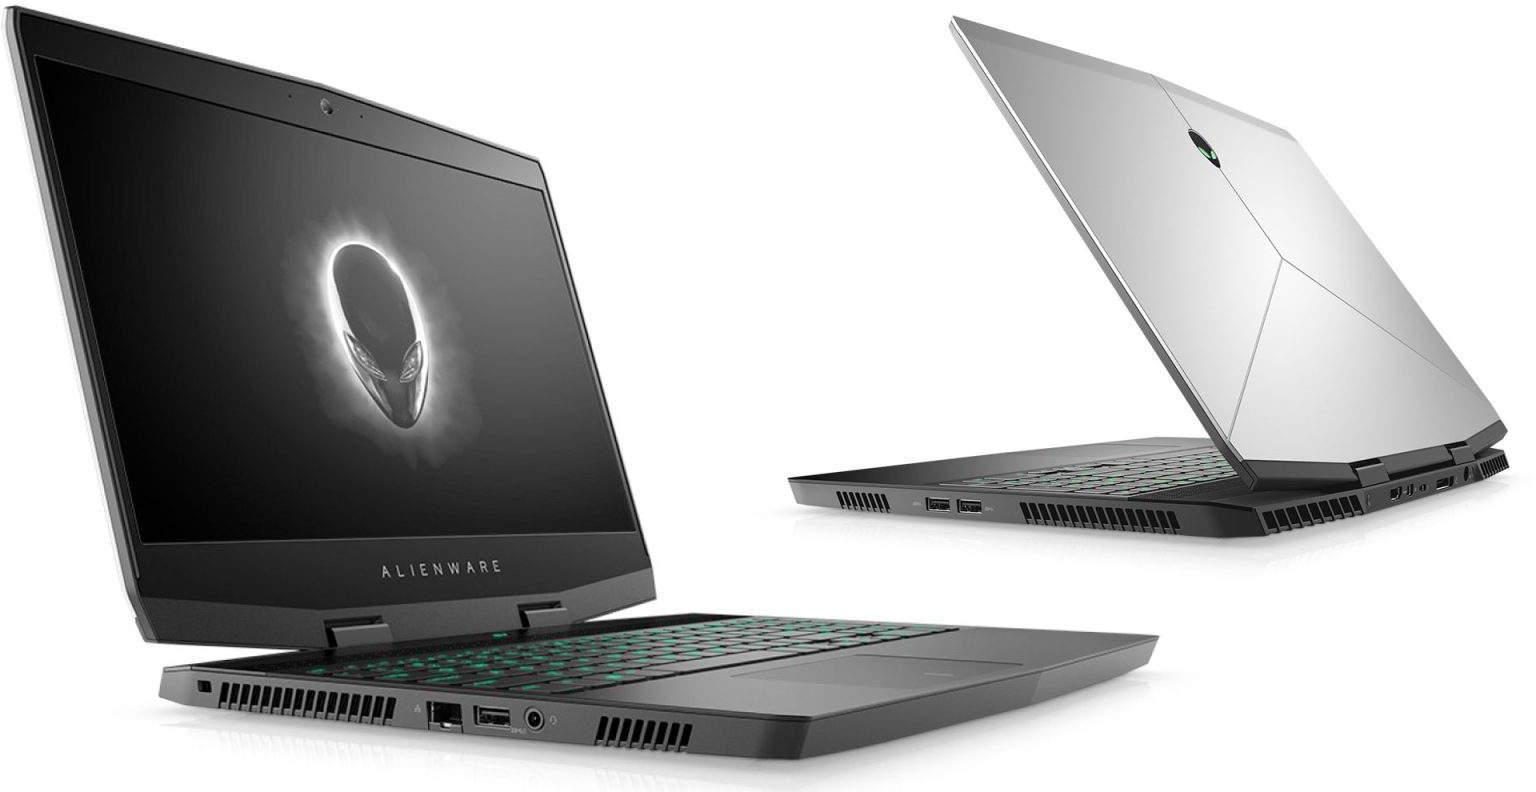 Купить Ноутбук Dell Alienware M15 (M15-5553) фото 3